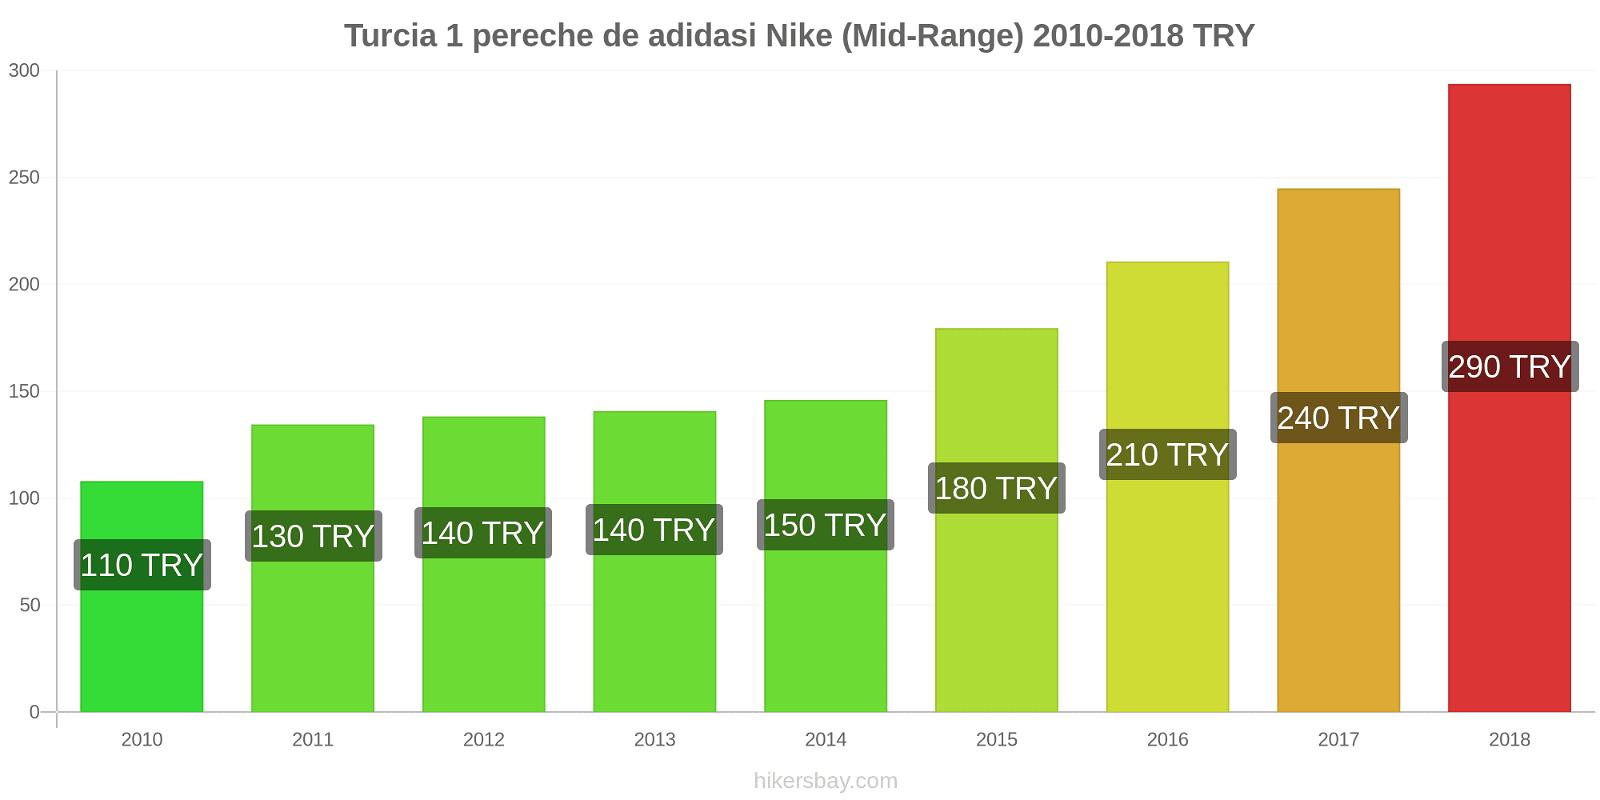 Turcia modificări de preț 1 pereche de adidasi Nike (Mid-Range) hikersbay.com